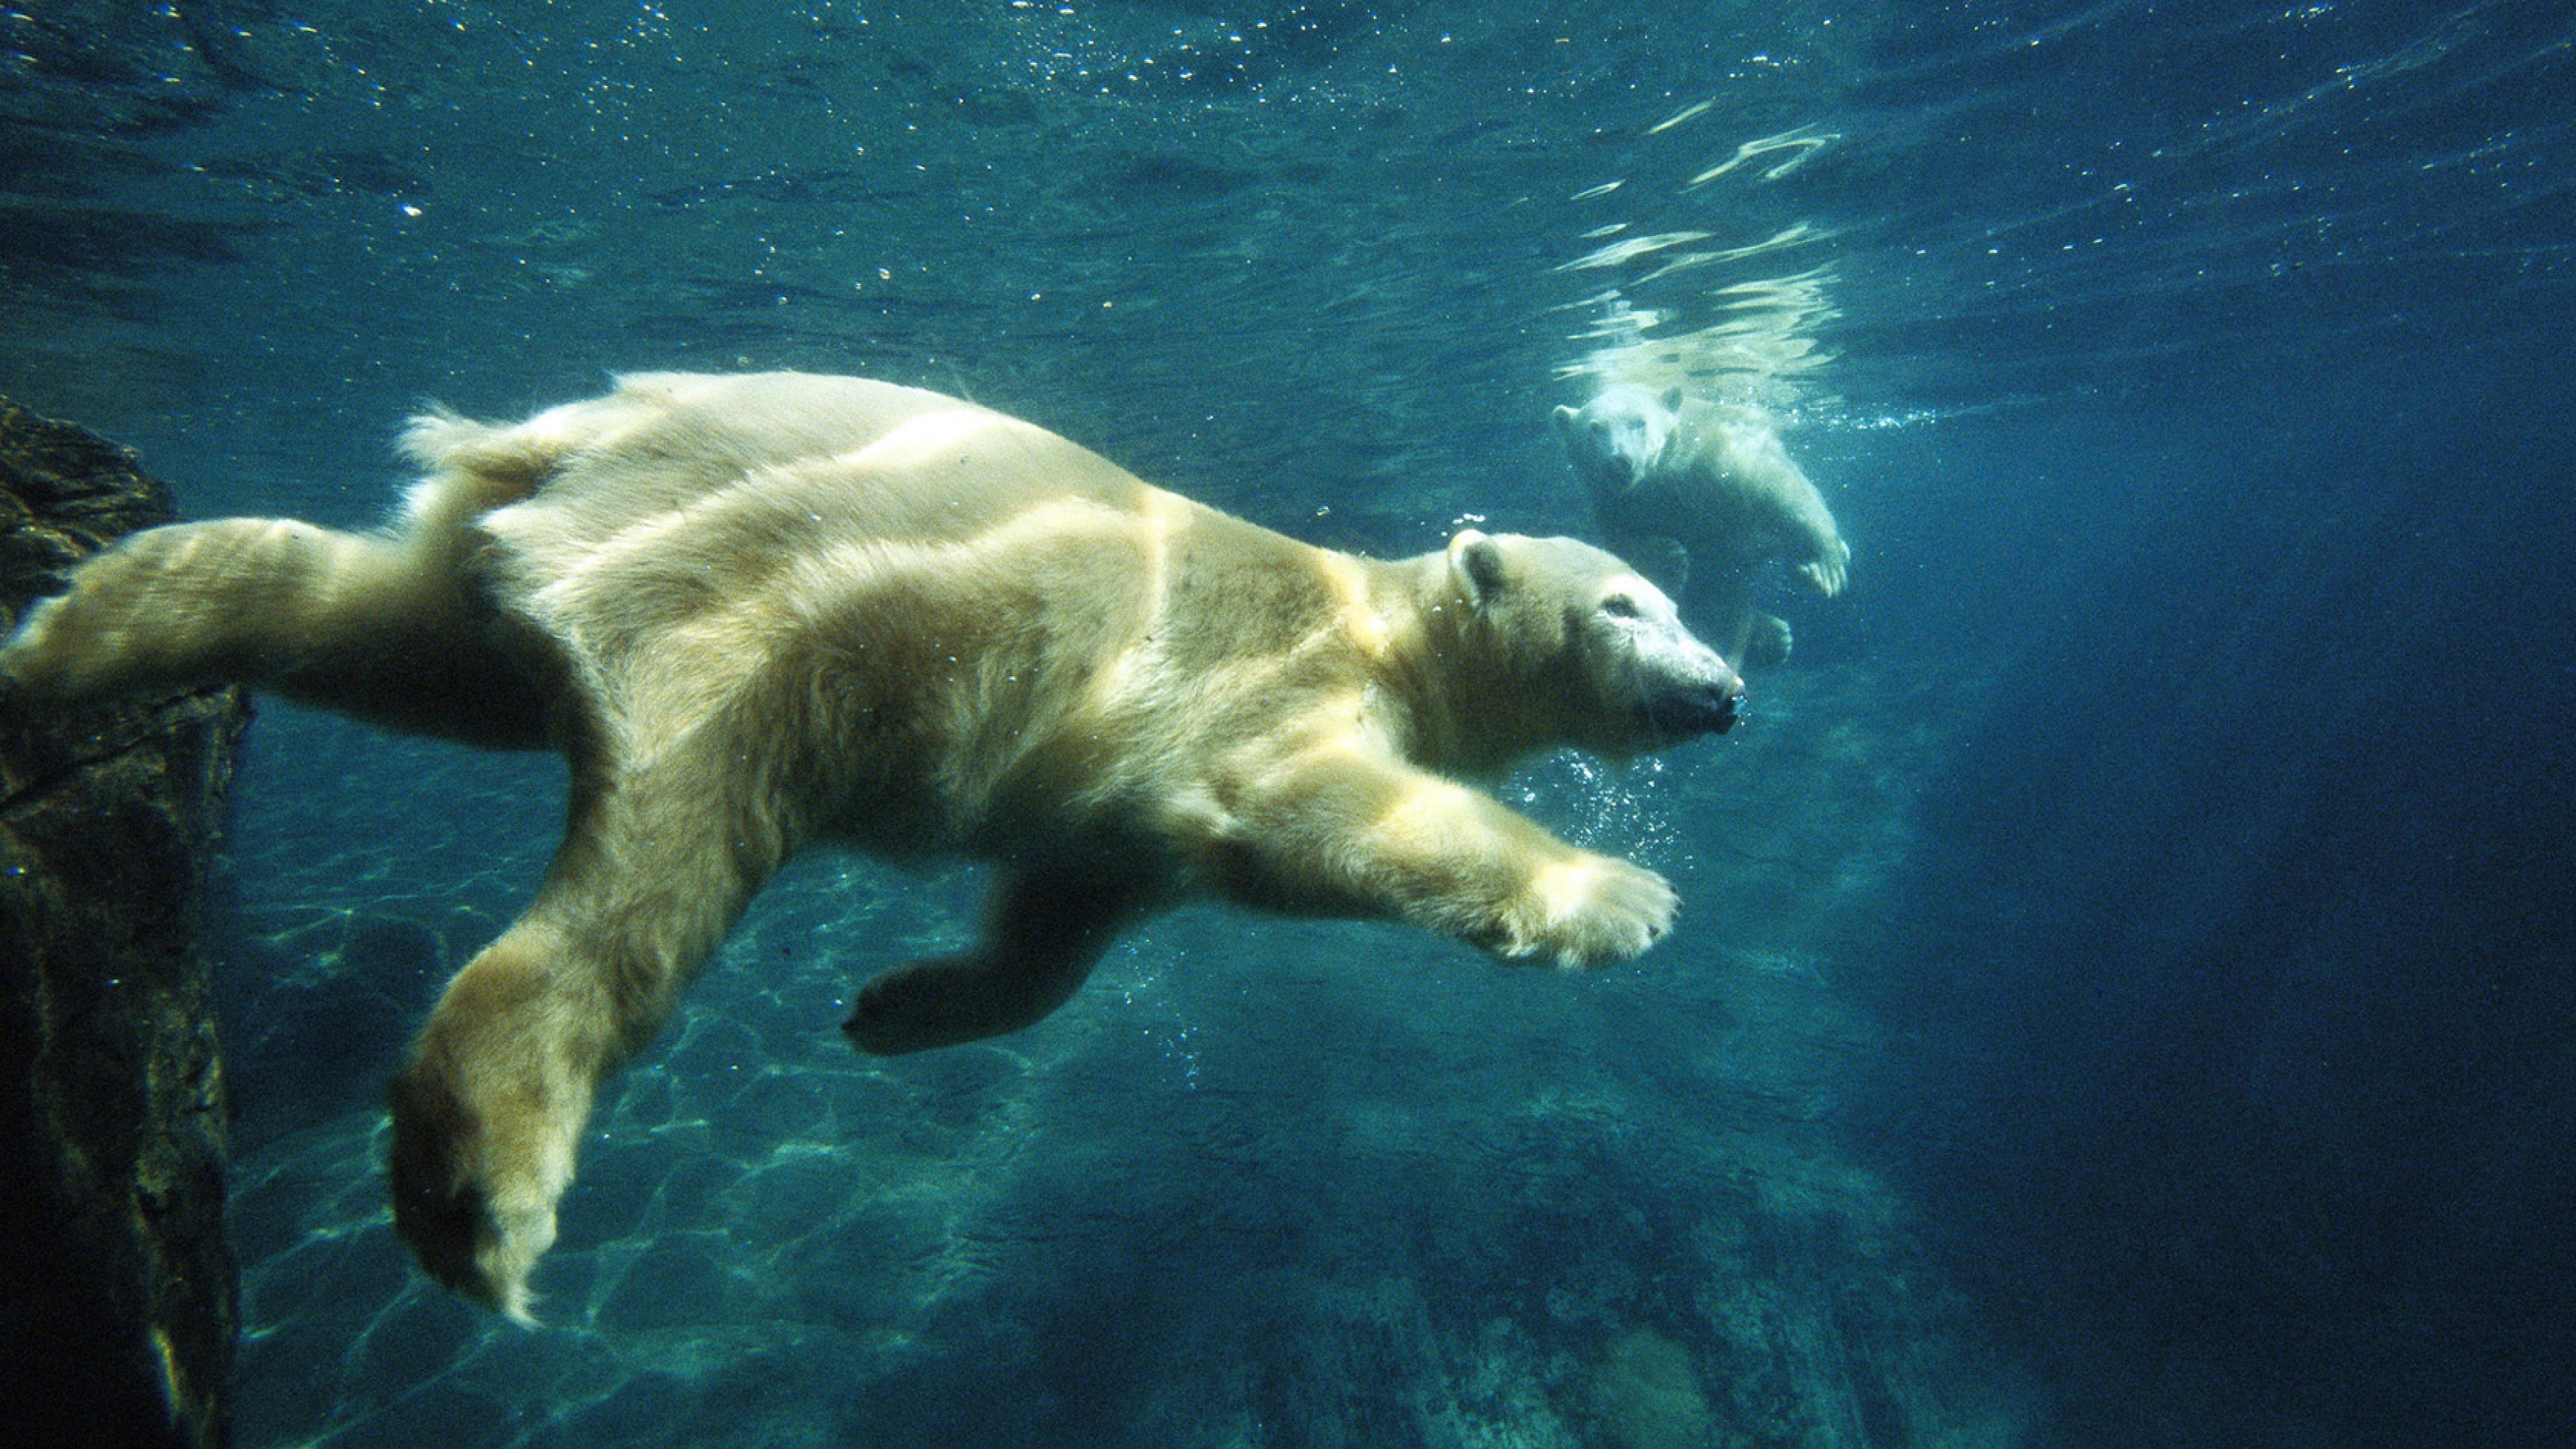 Polar Bear Swimming Underwater Animals Ultra 3840x2160 Computer